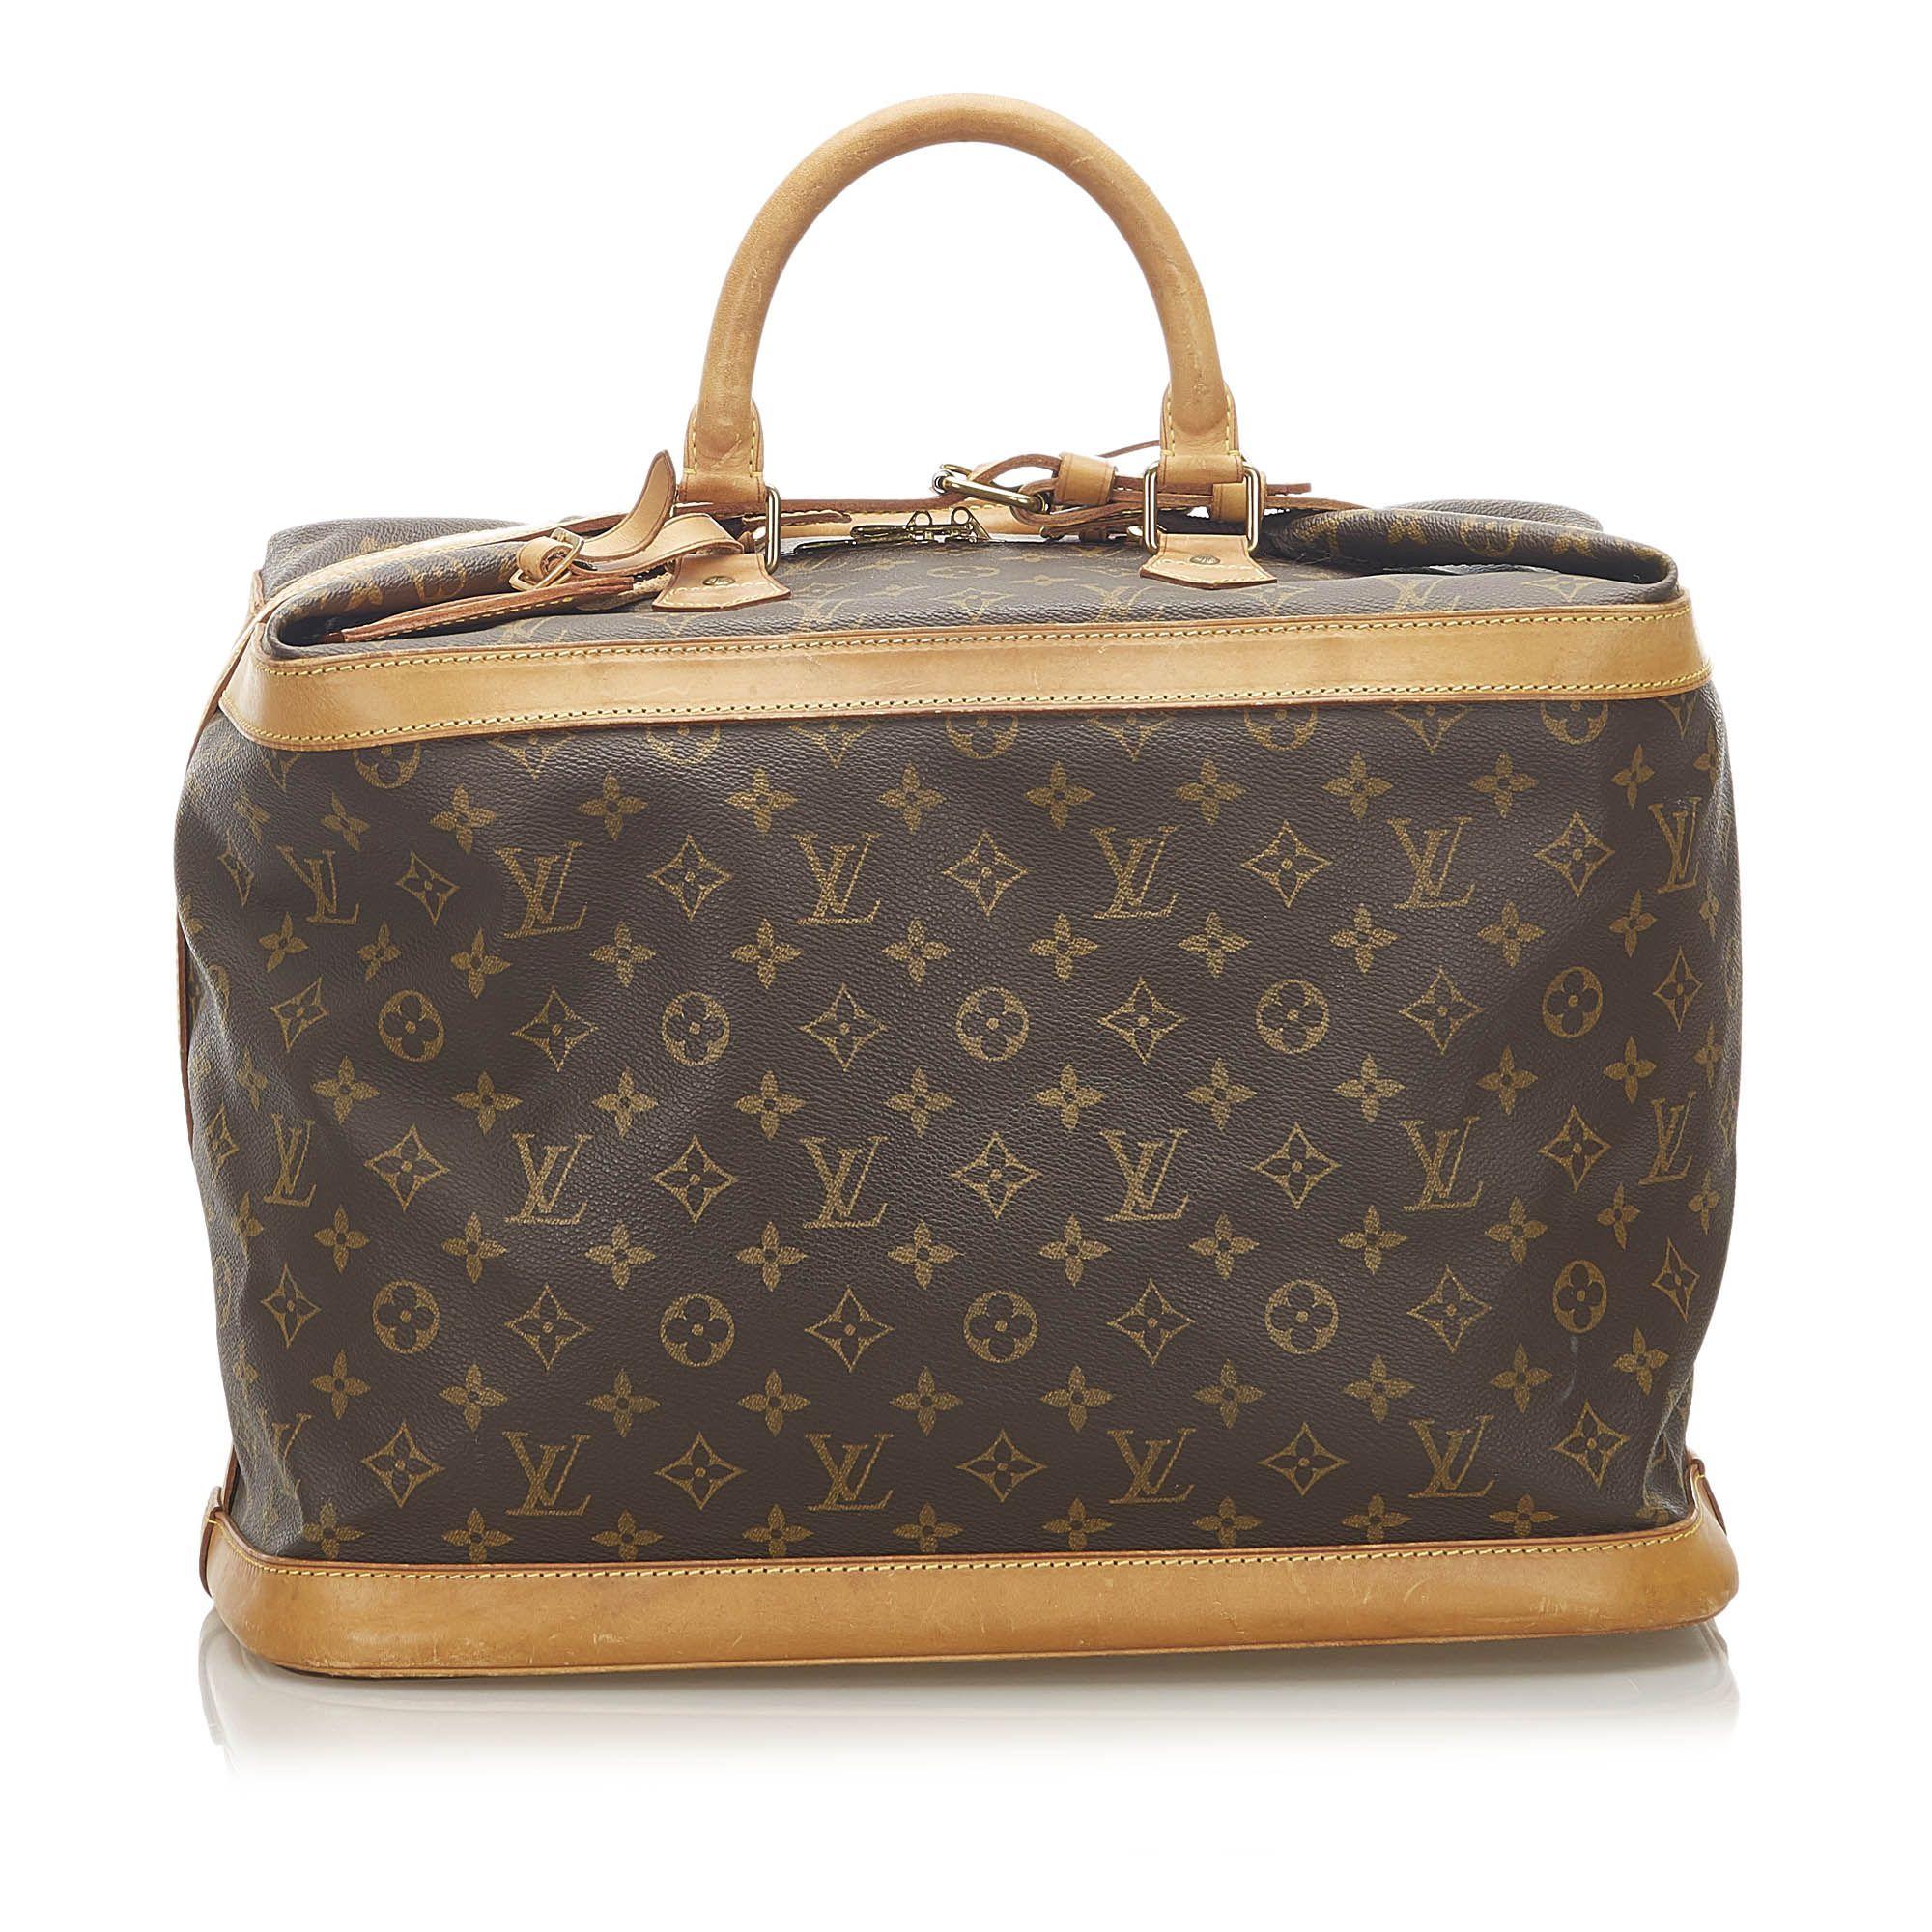 Vintage Louis Vuitton Monogram Cruiser 55 Brown